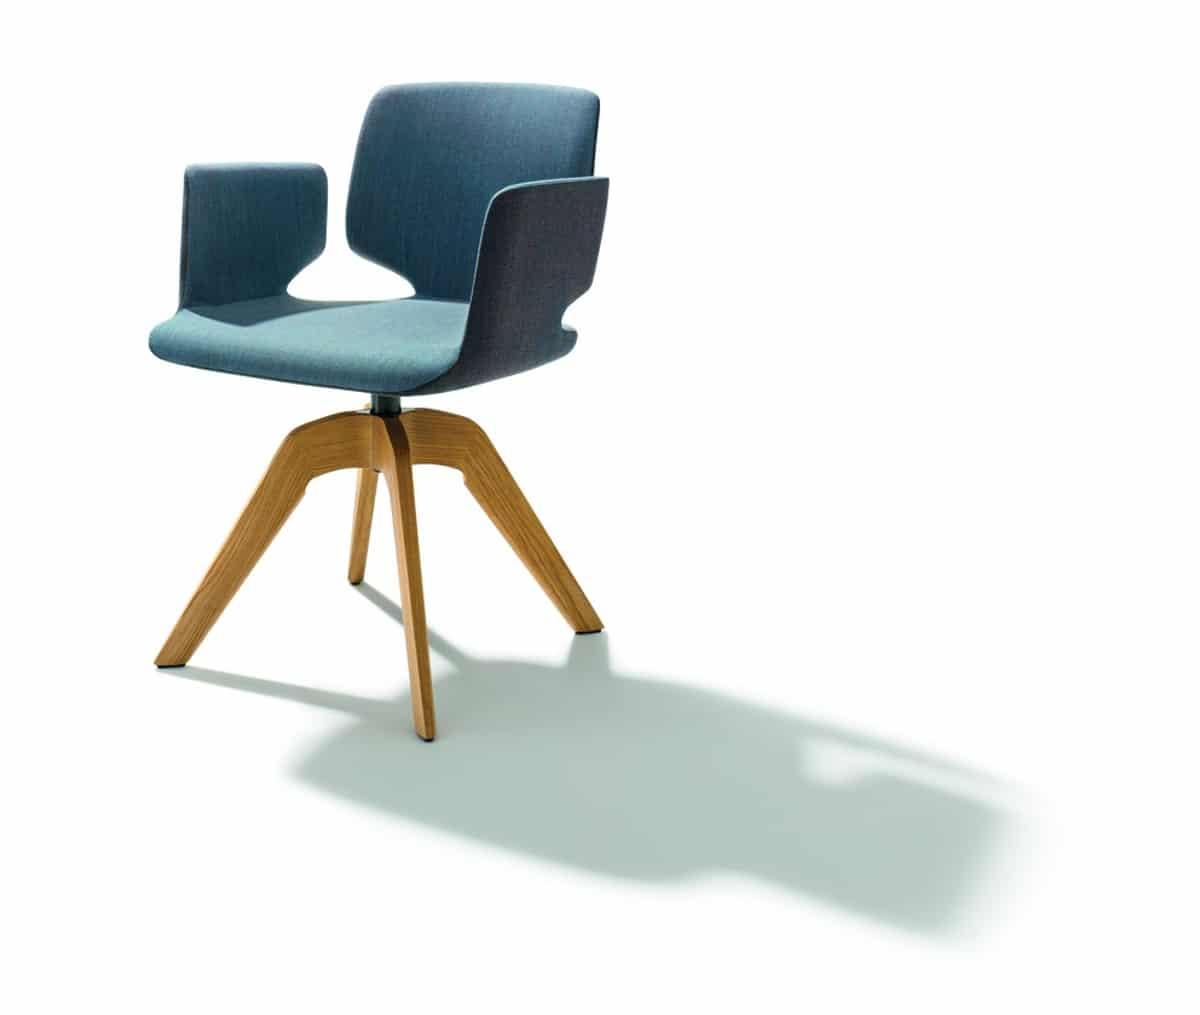 stuhl aye mit drehgestell kohler nat rlich einrichten naturholzm bel team 7 naturm bel. Black Bedroom Furniture Sets. Home Design Ideas